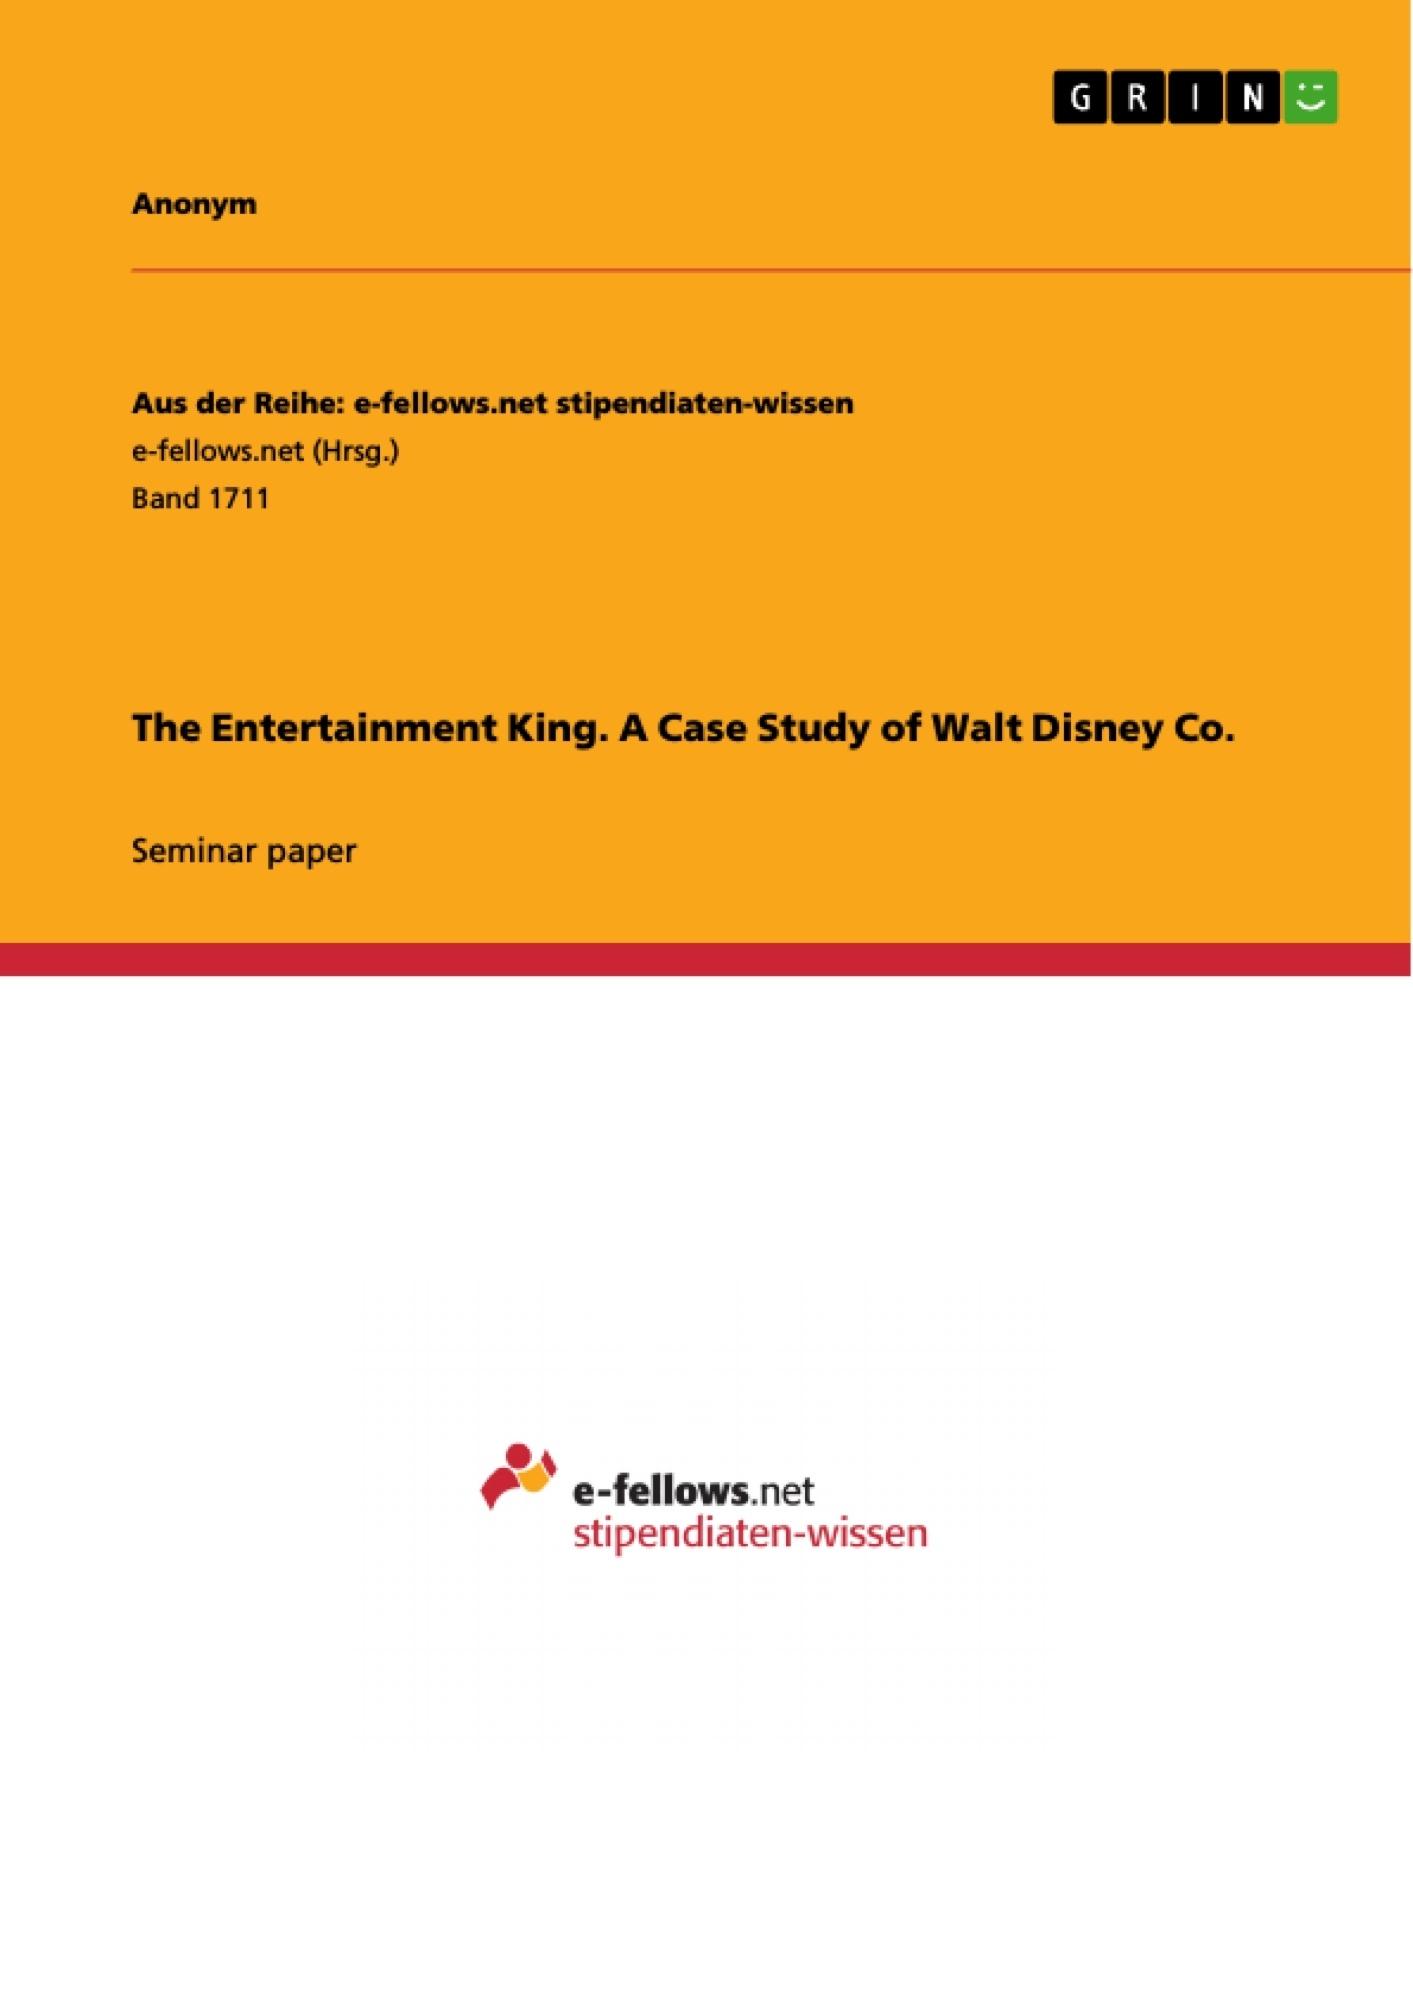 Title: The Entertainment King. A Case Study of Walt Disney Co.